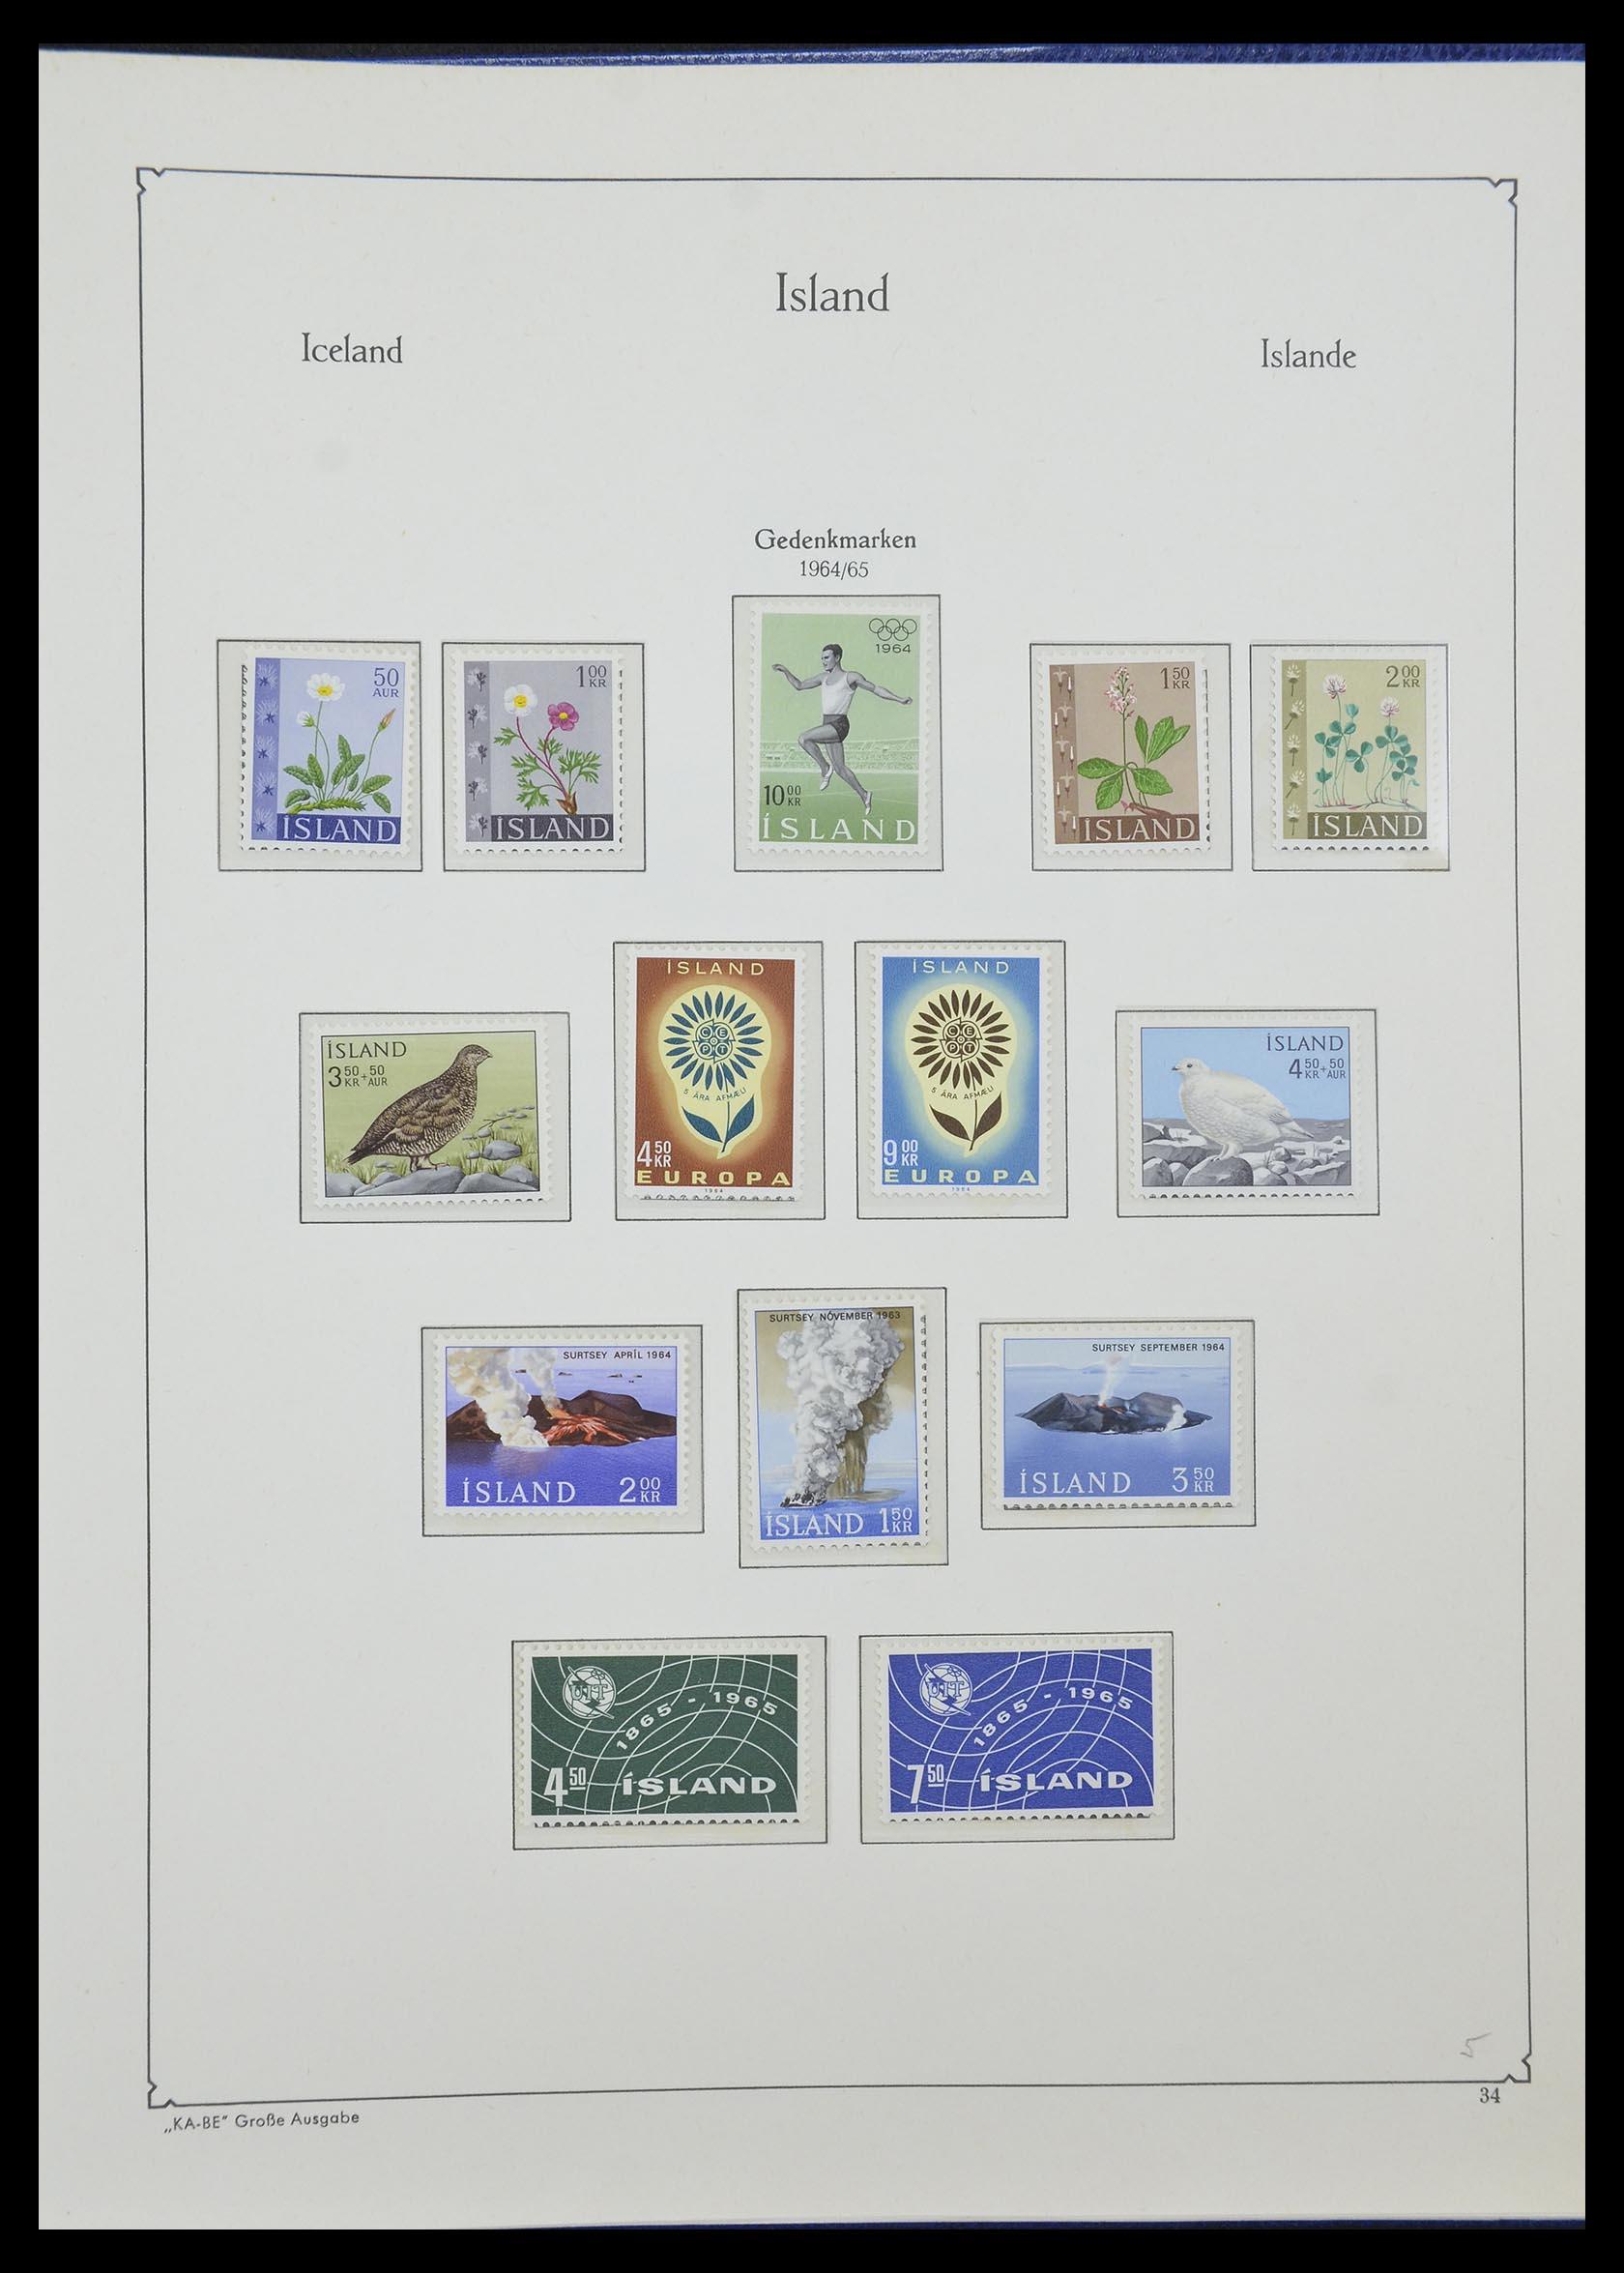 33185 017 - Postzegelverzameling 33184 Finland 1856-1990.